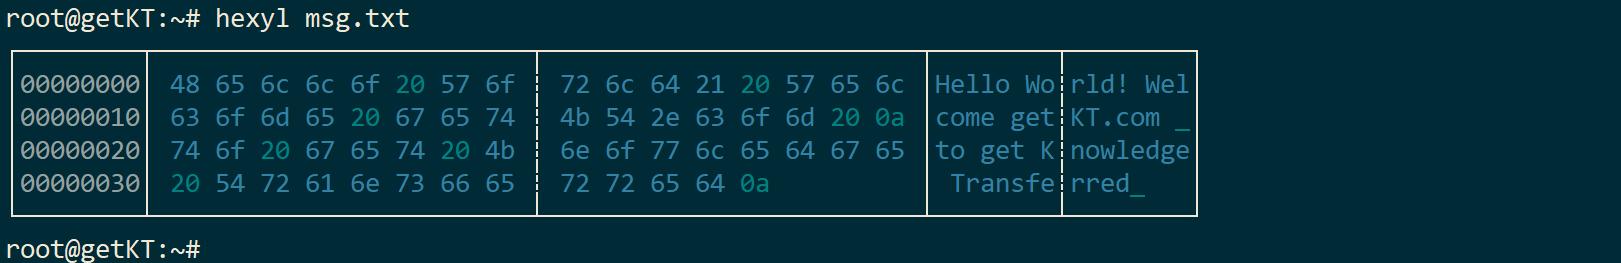 hexdump using command hexyl